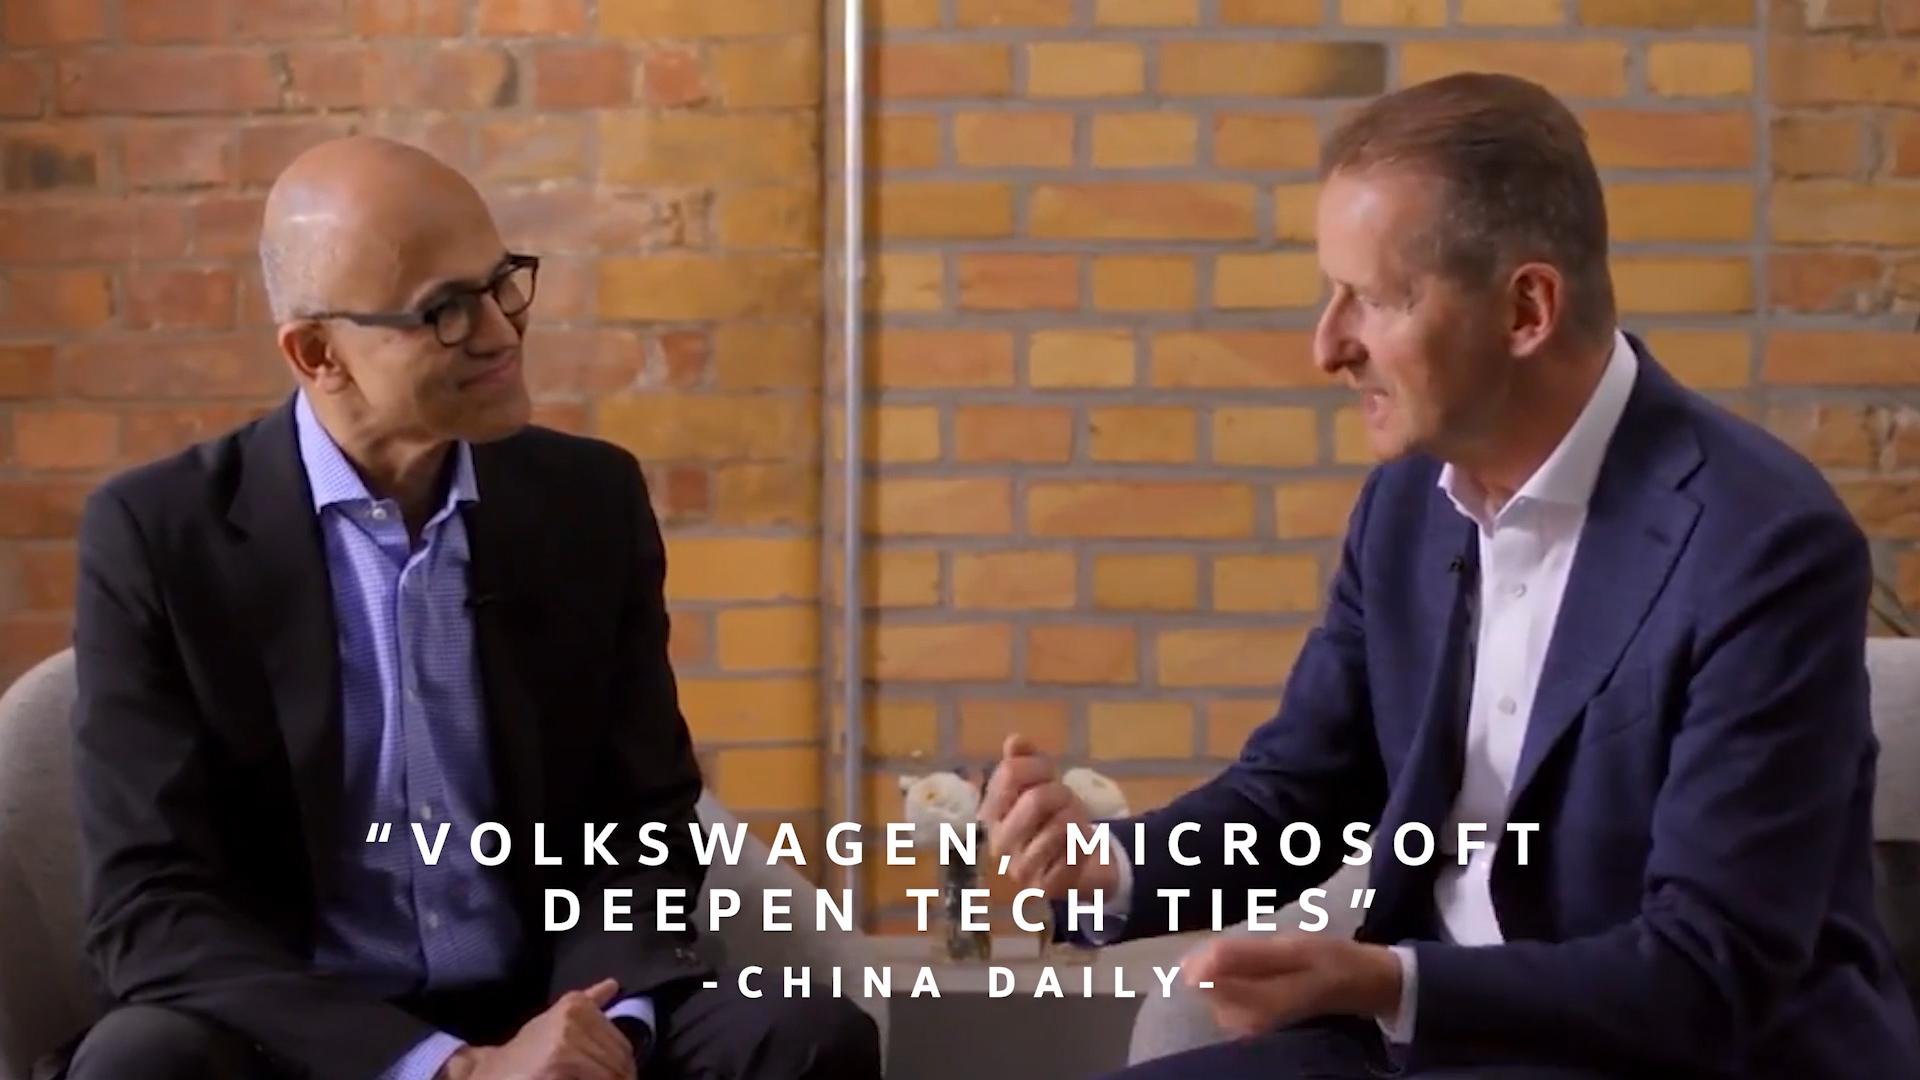 VW jahrsrückblick 2019_03.jpg